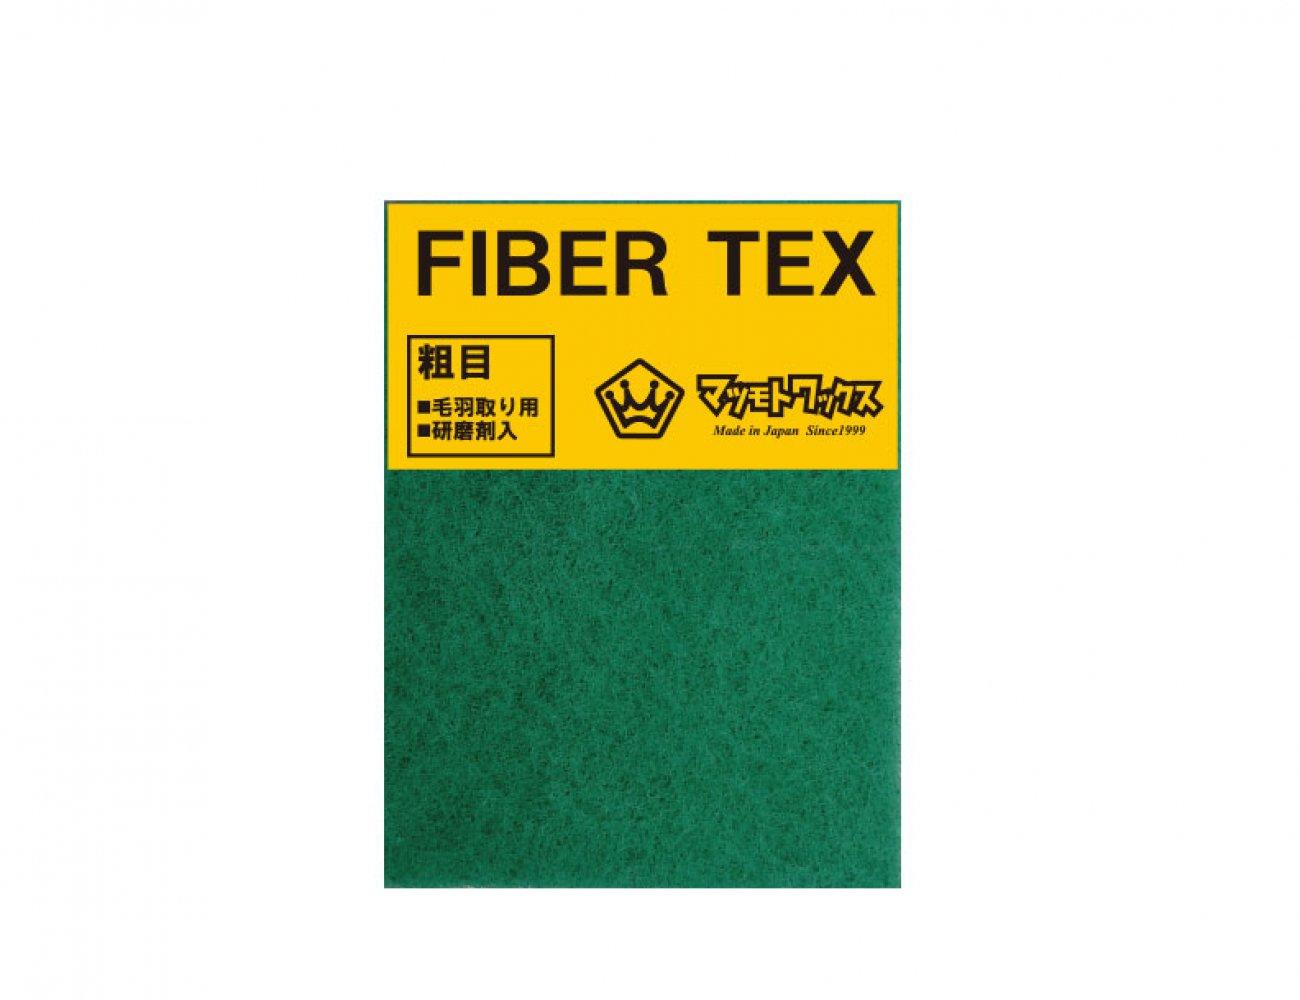 fibertex_arame.jpg